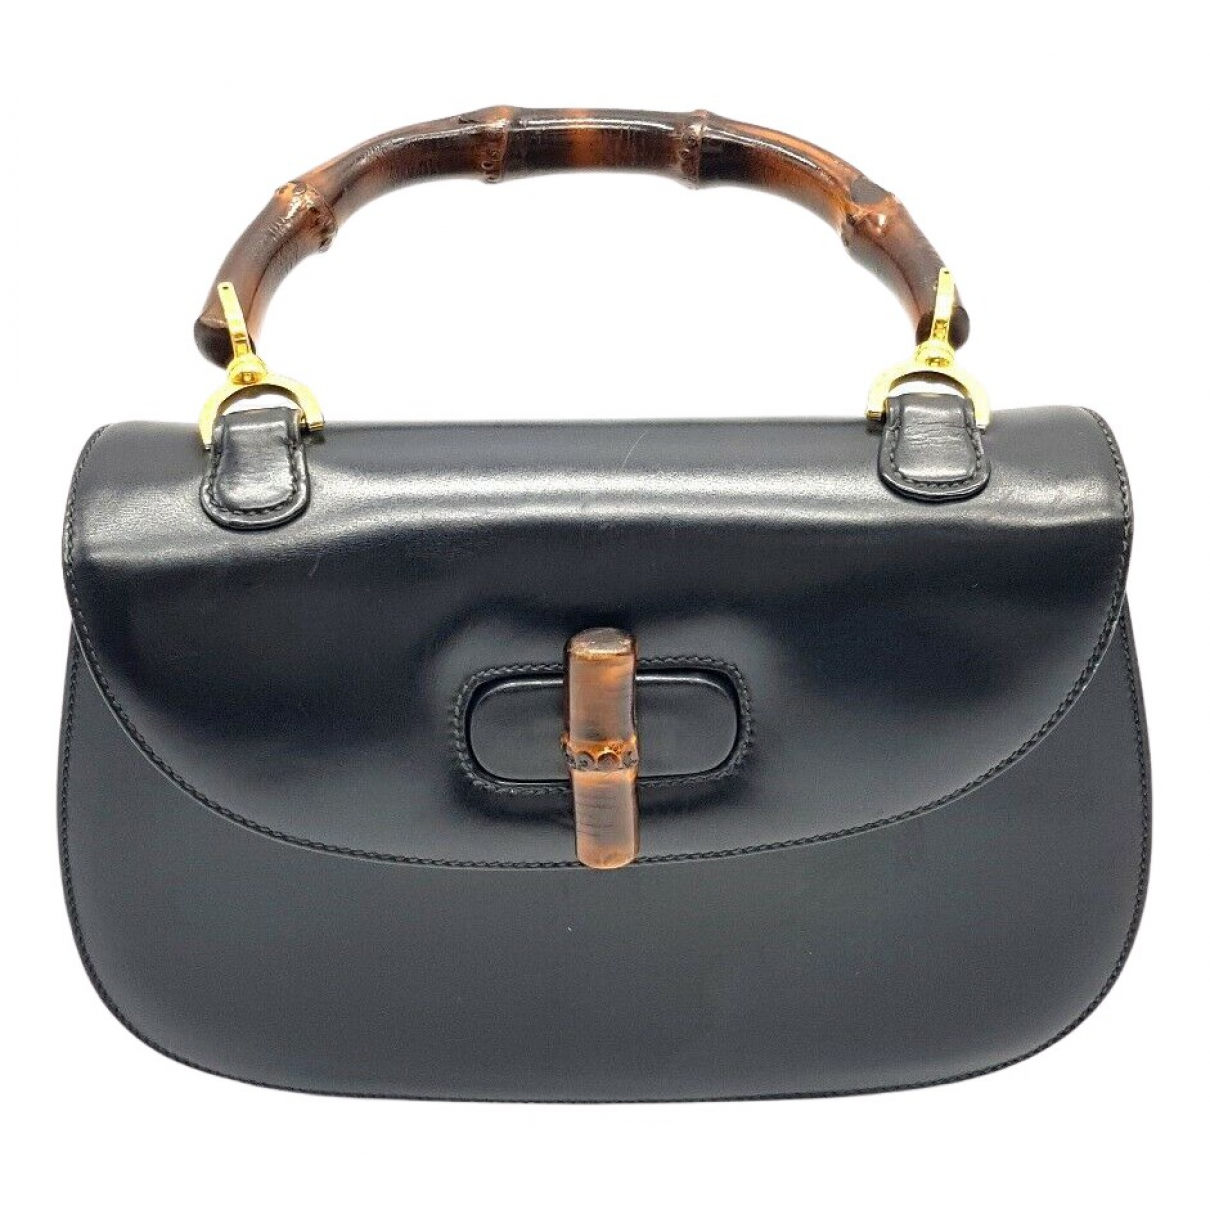 Gucci Bamboo Black Leather handbag for Women N